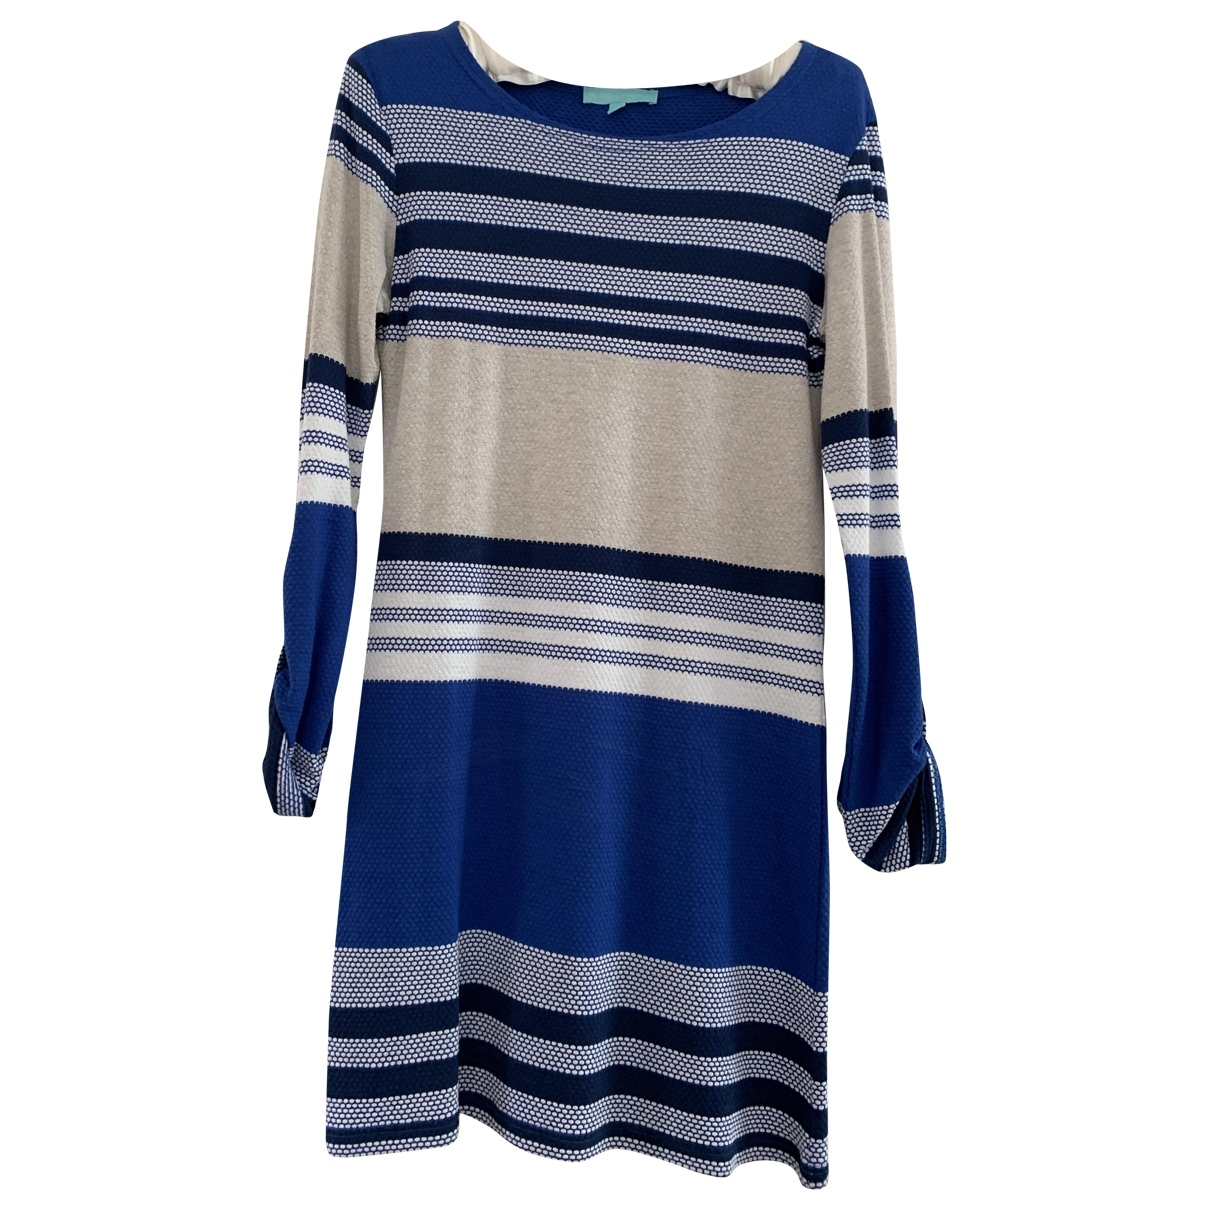 Melissa Odabash \N Multicolour Cotton dress for Women 8 UK